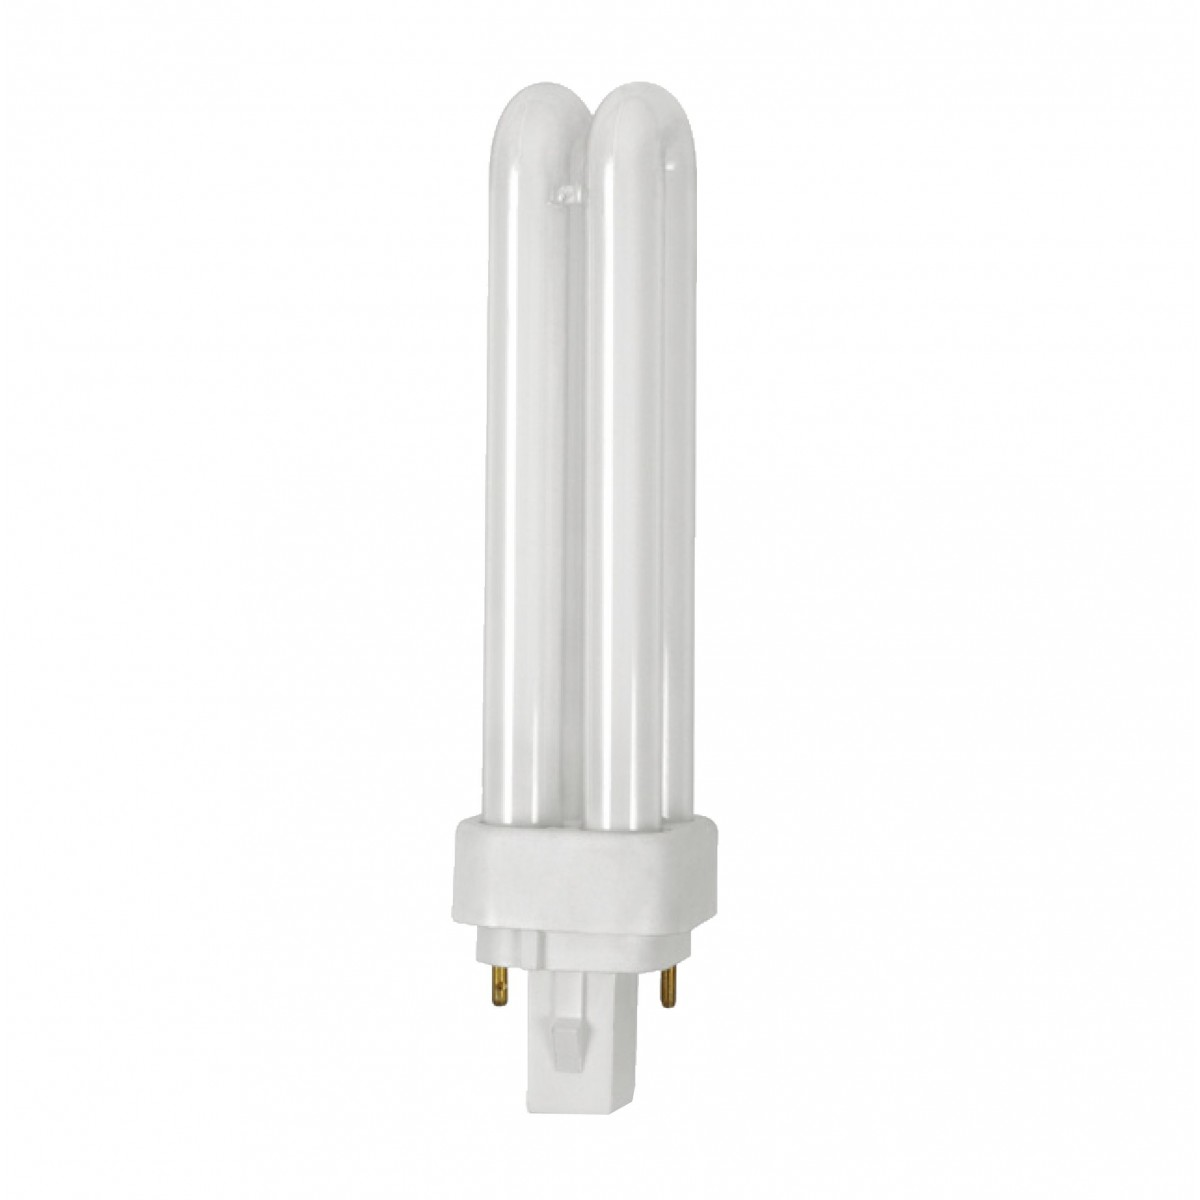 LAMP FL-C 26W /840 G24D